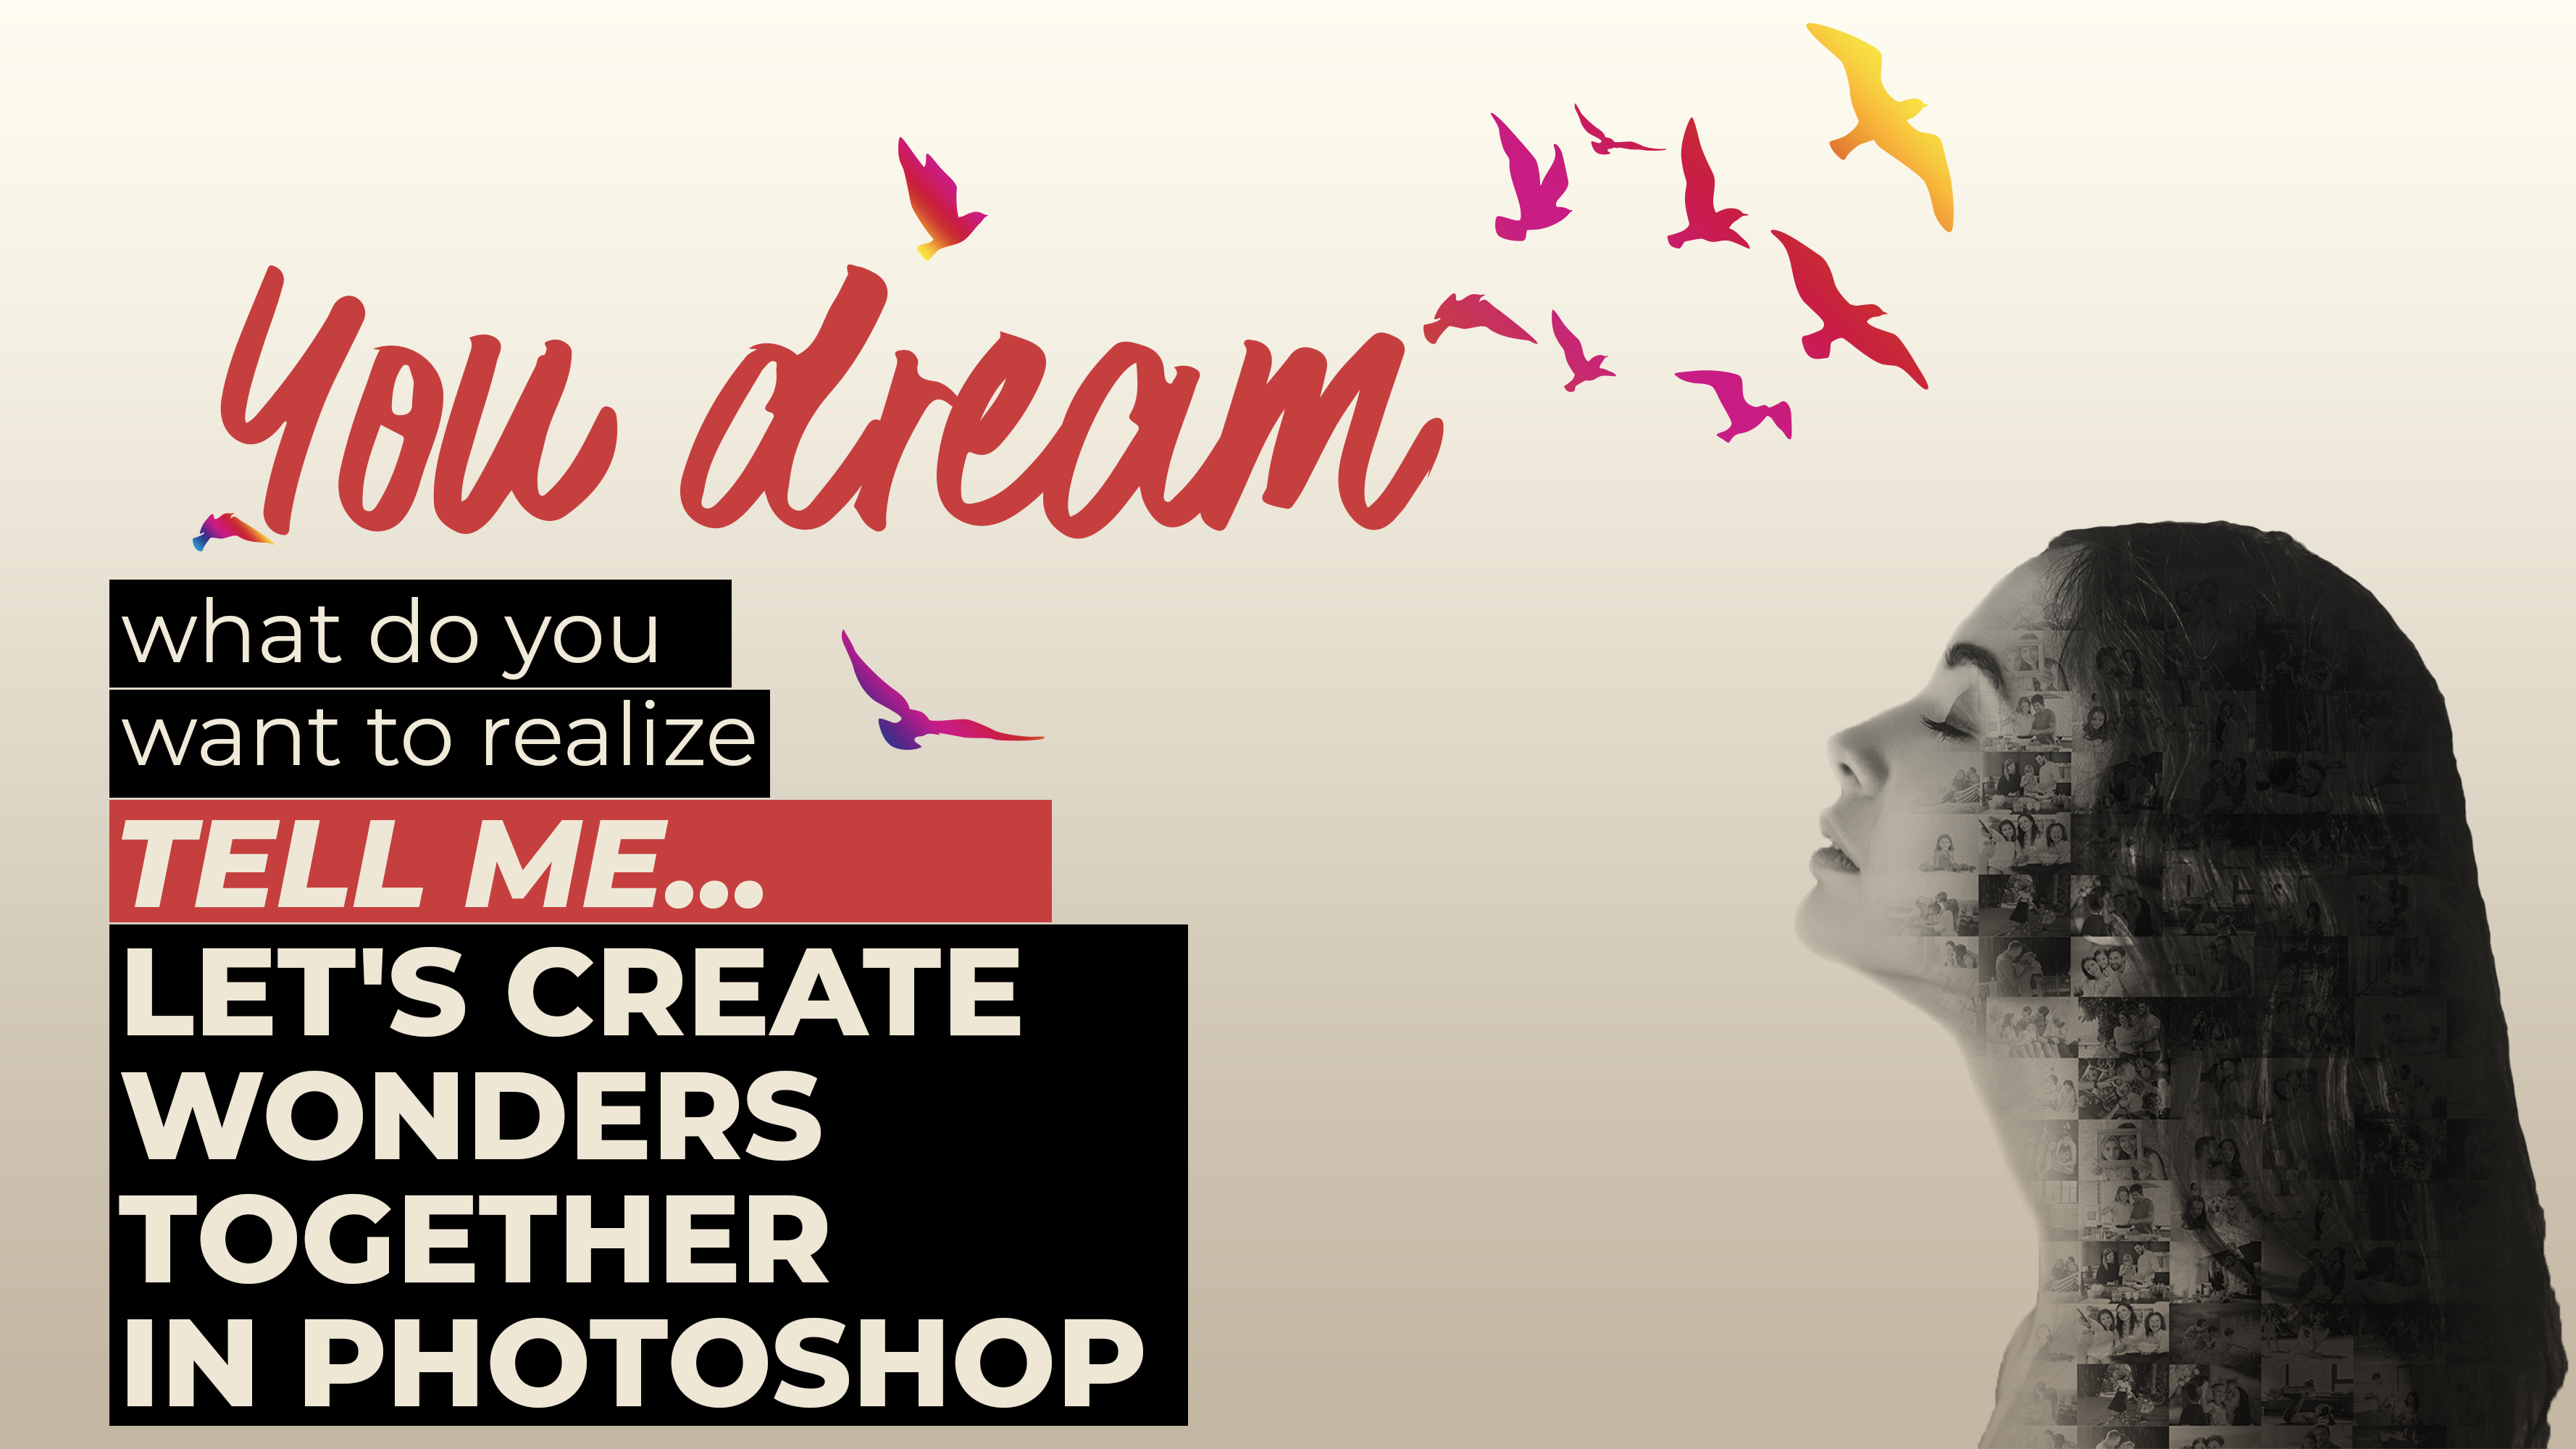 creative professional photoshop services